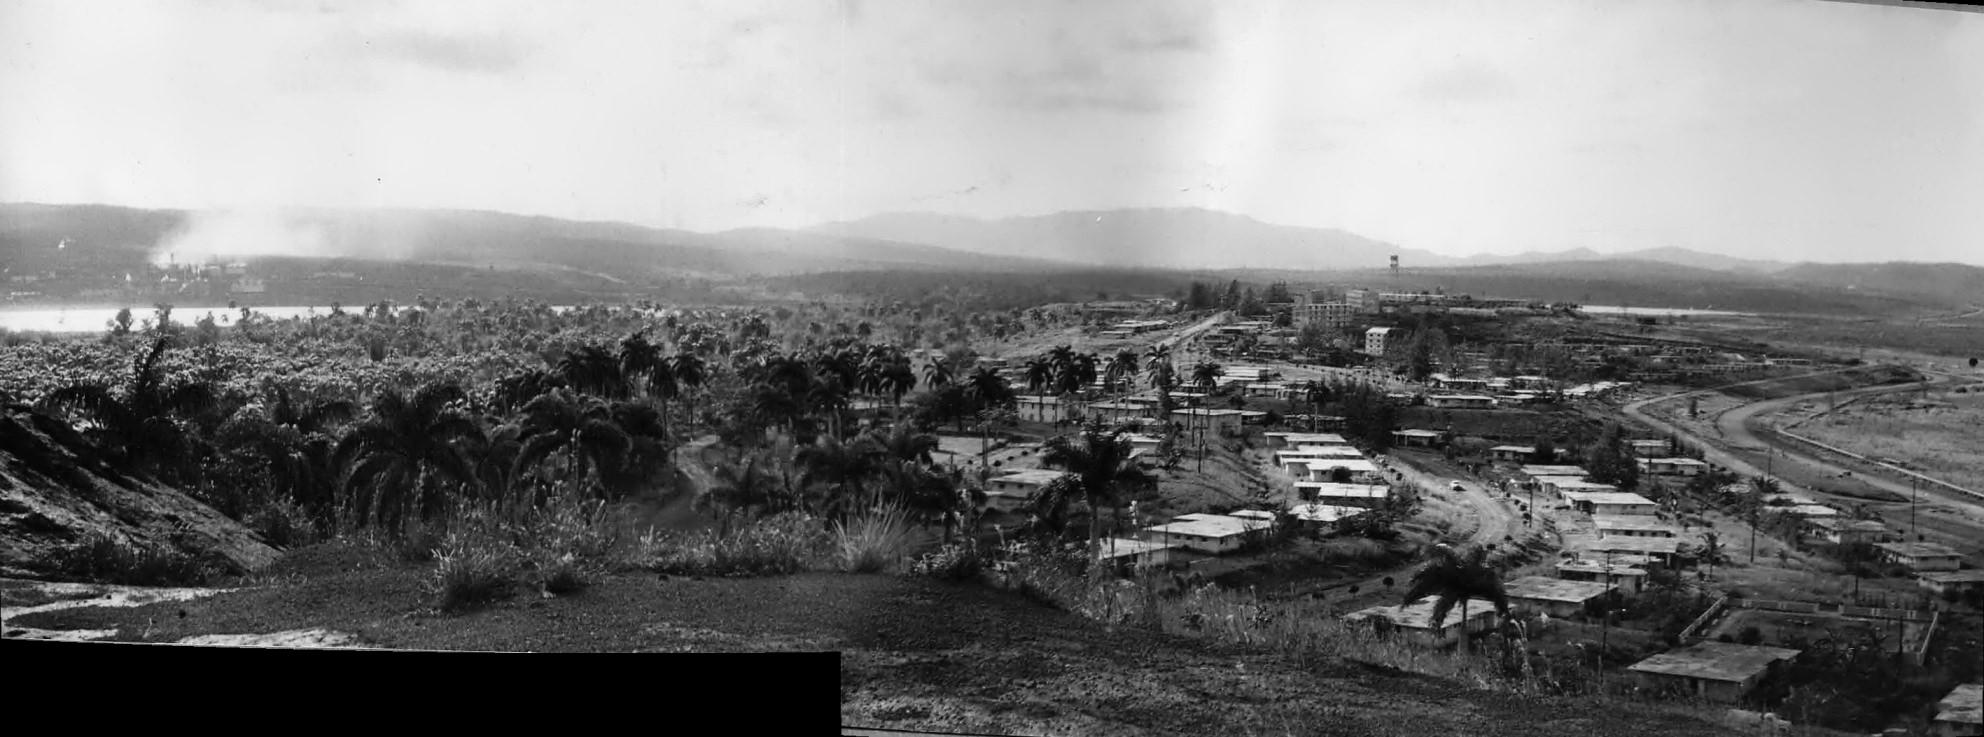 1964-1966. Панорама Моа. Фото 2.